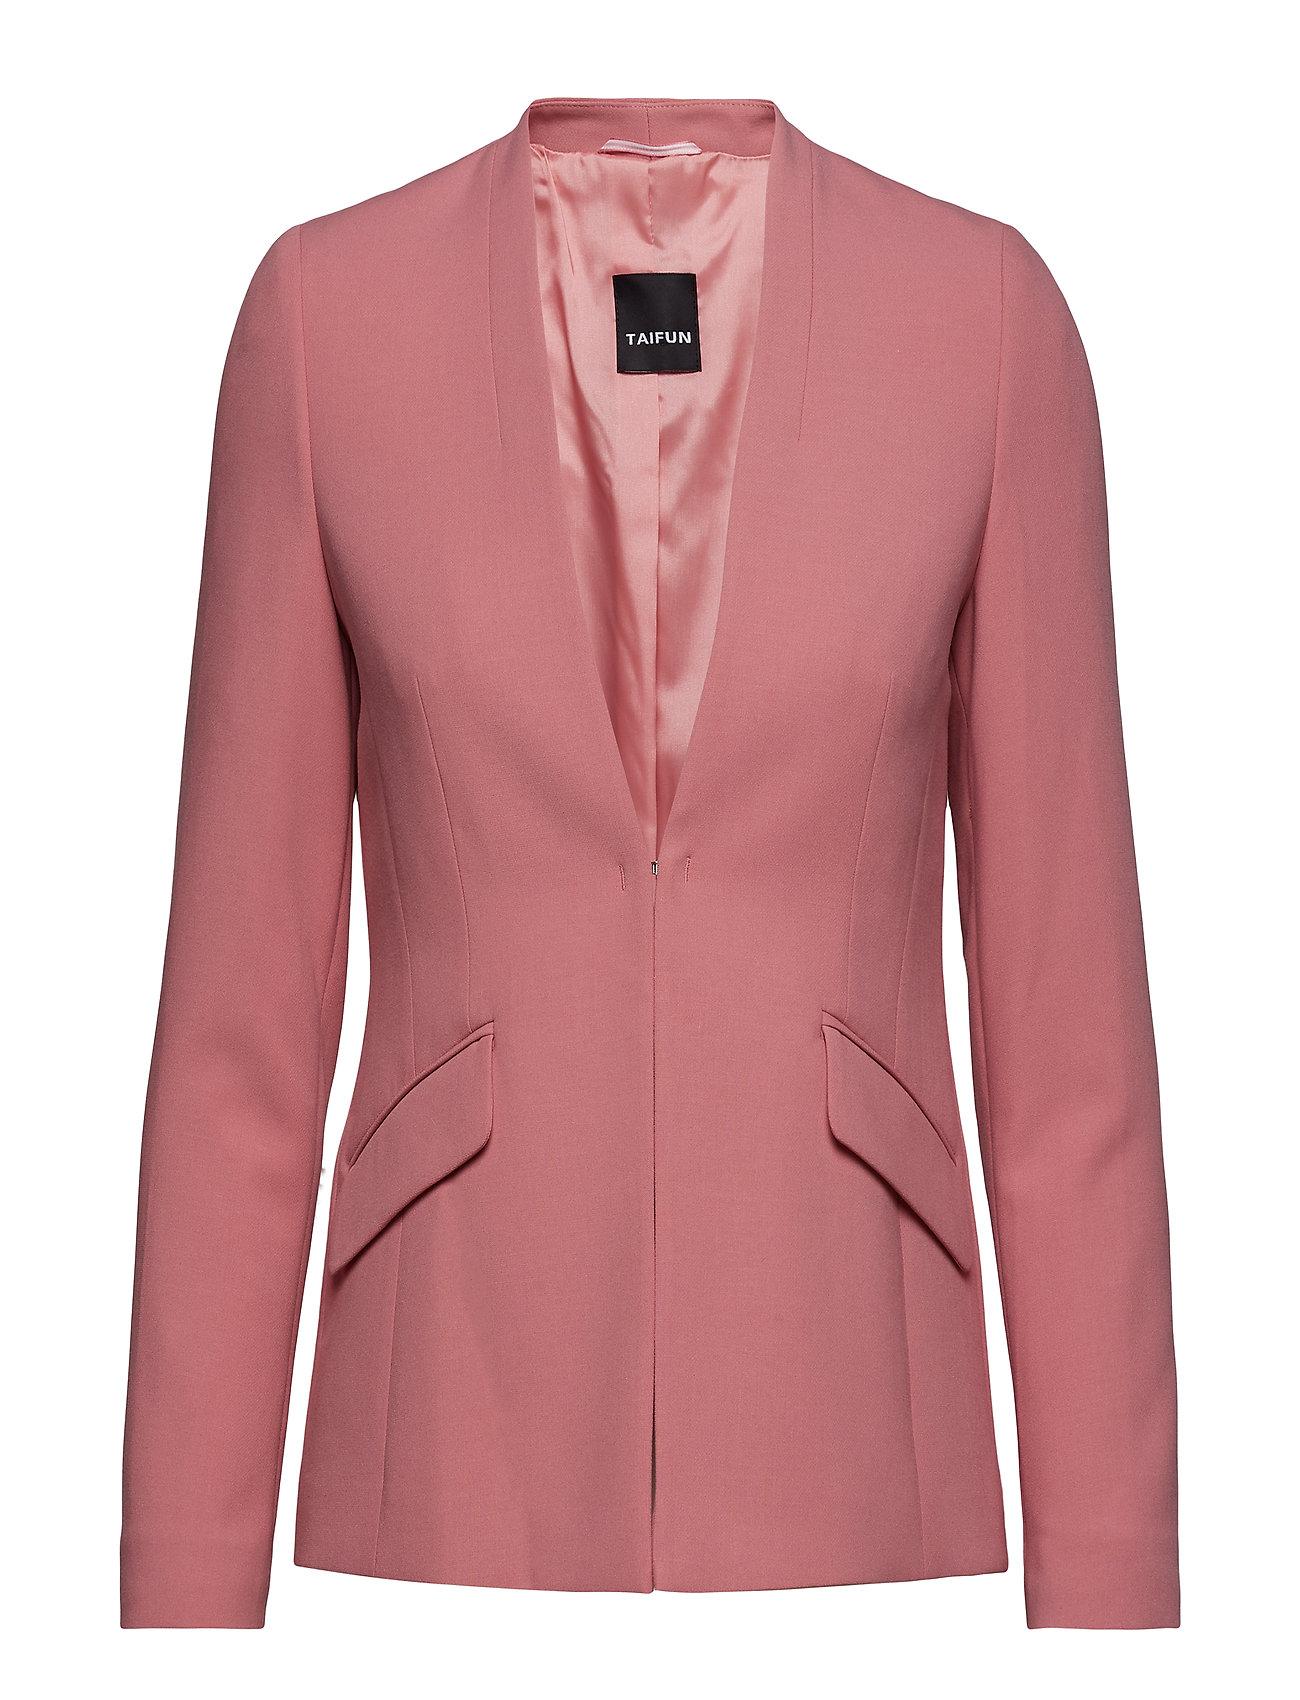 sleevedusty sleevedusty sleevedusty Blazer PinkTaifun Blazer Long Long Long PinkTaifun Blazer QxthsrdC